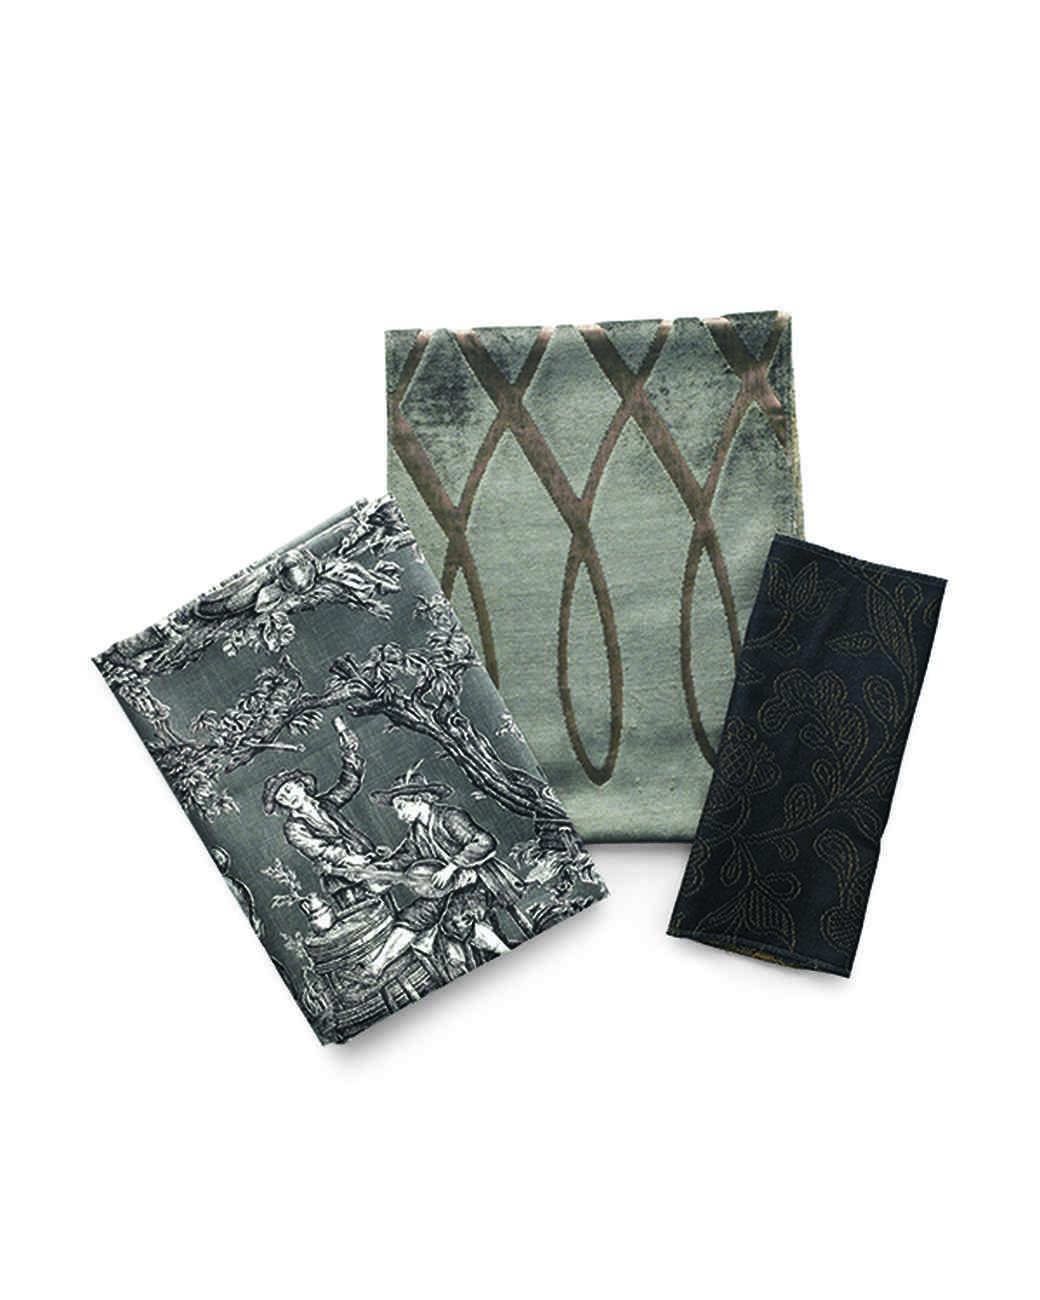 mld106167_1010_fabric01.jpg